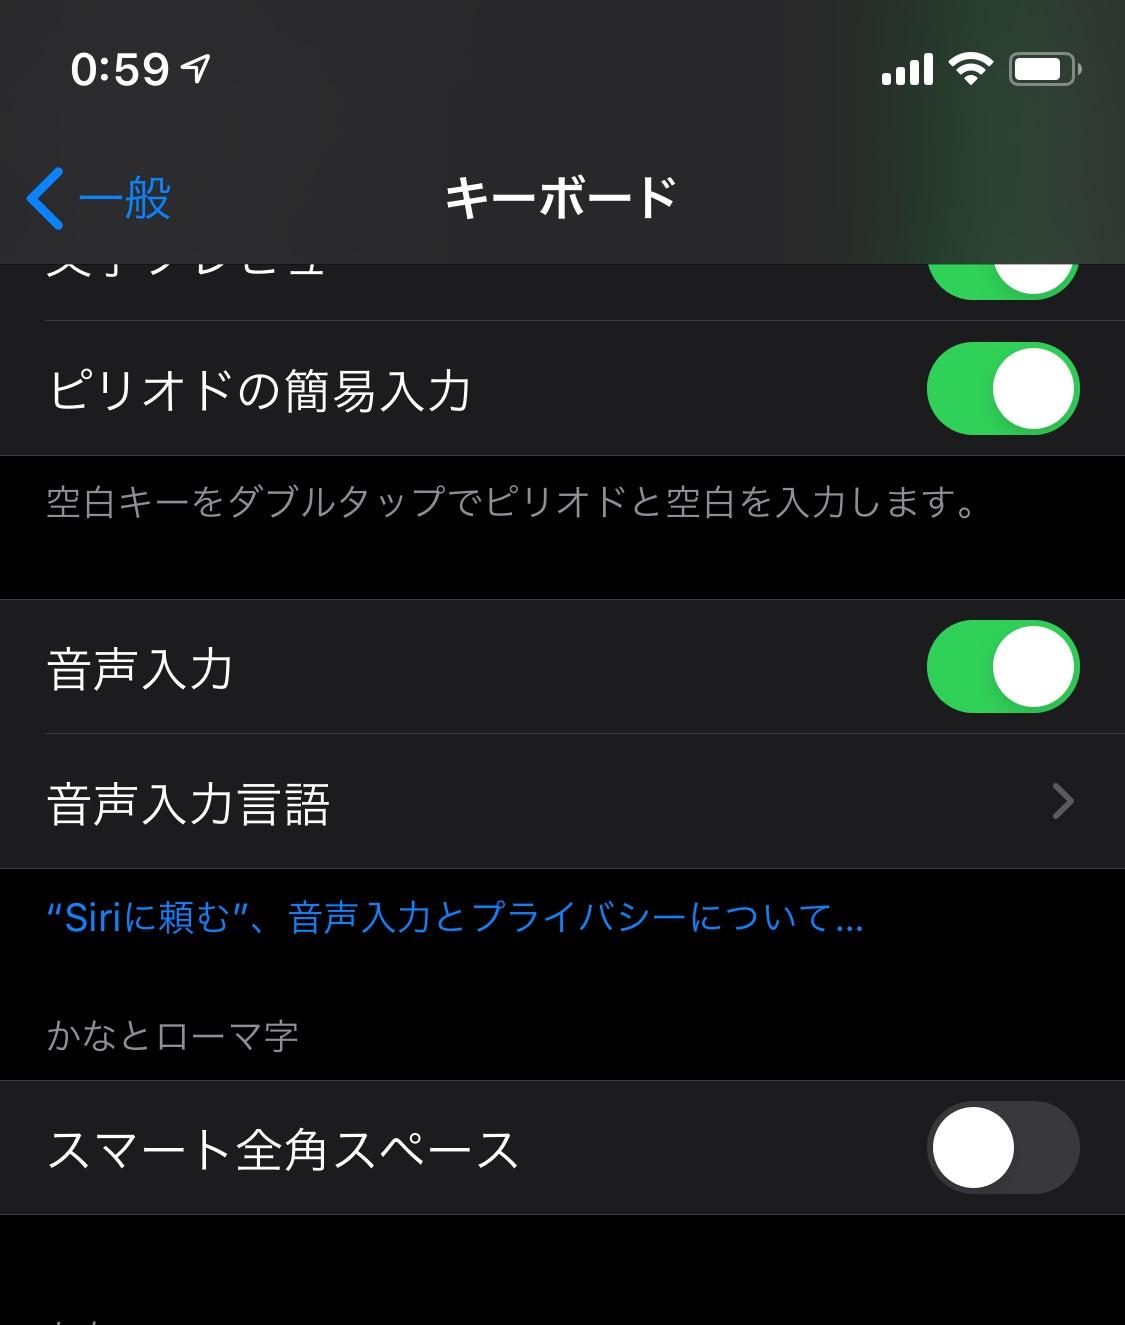 iOS 13「スマート全角スペース」機能をオフにする方法